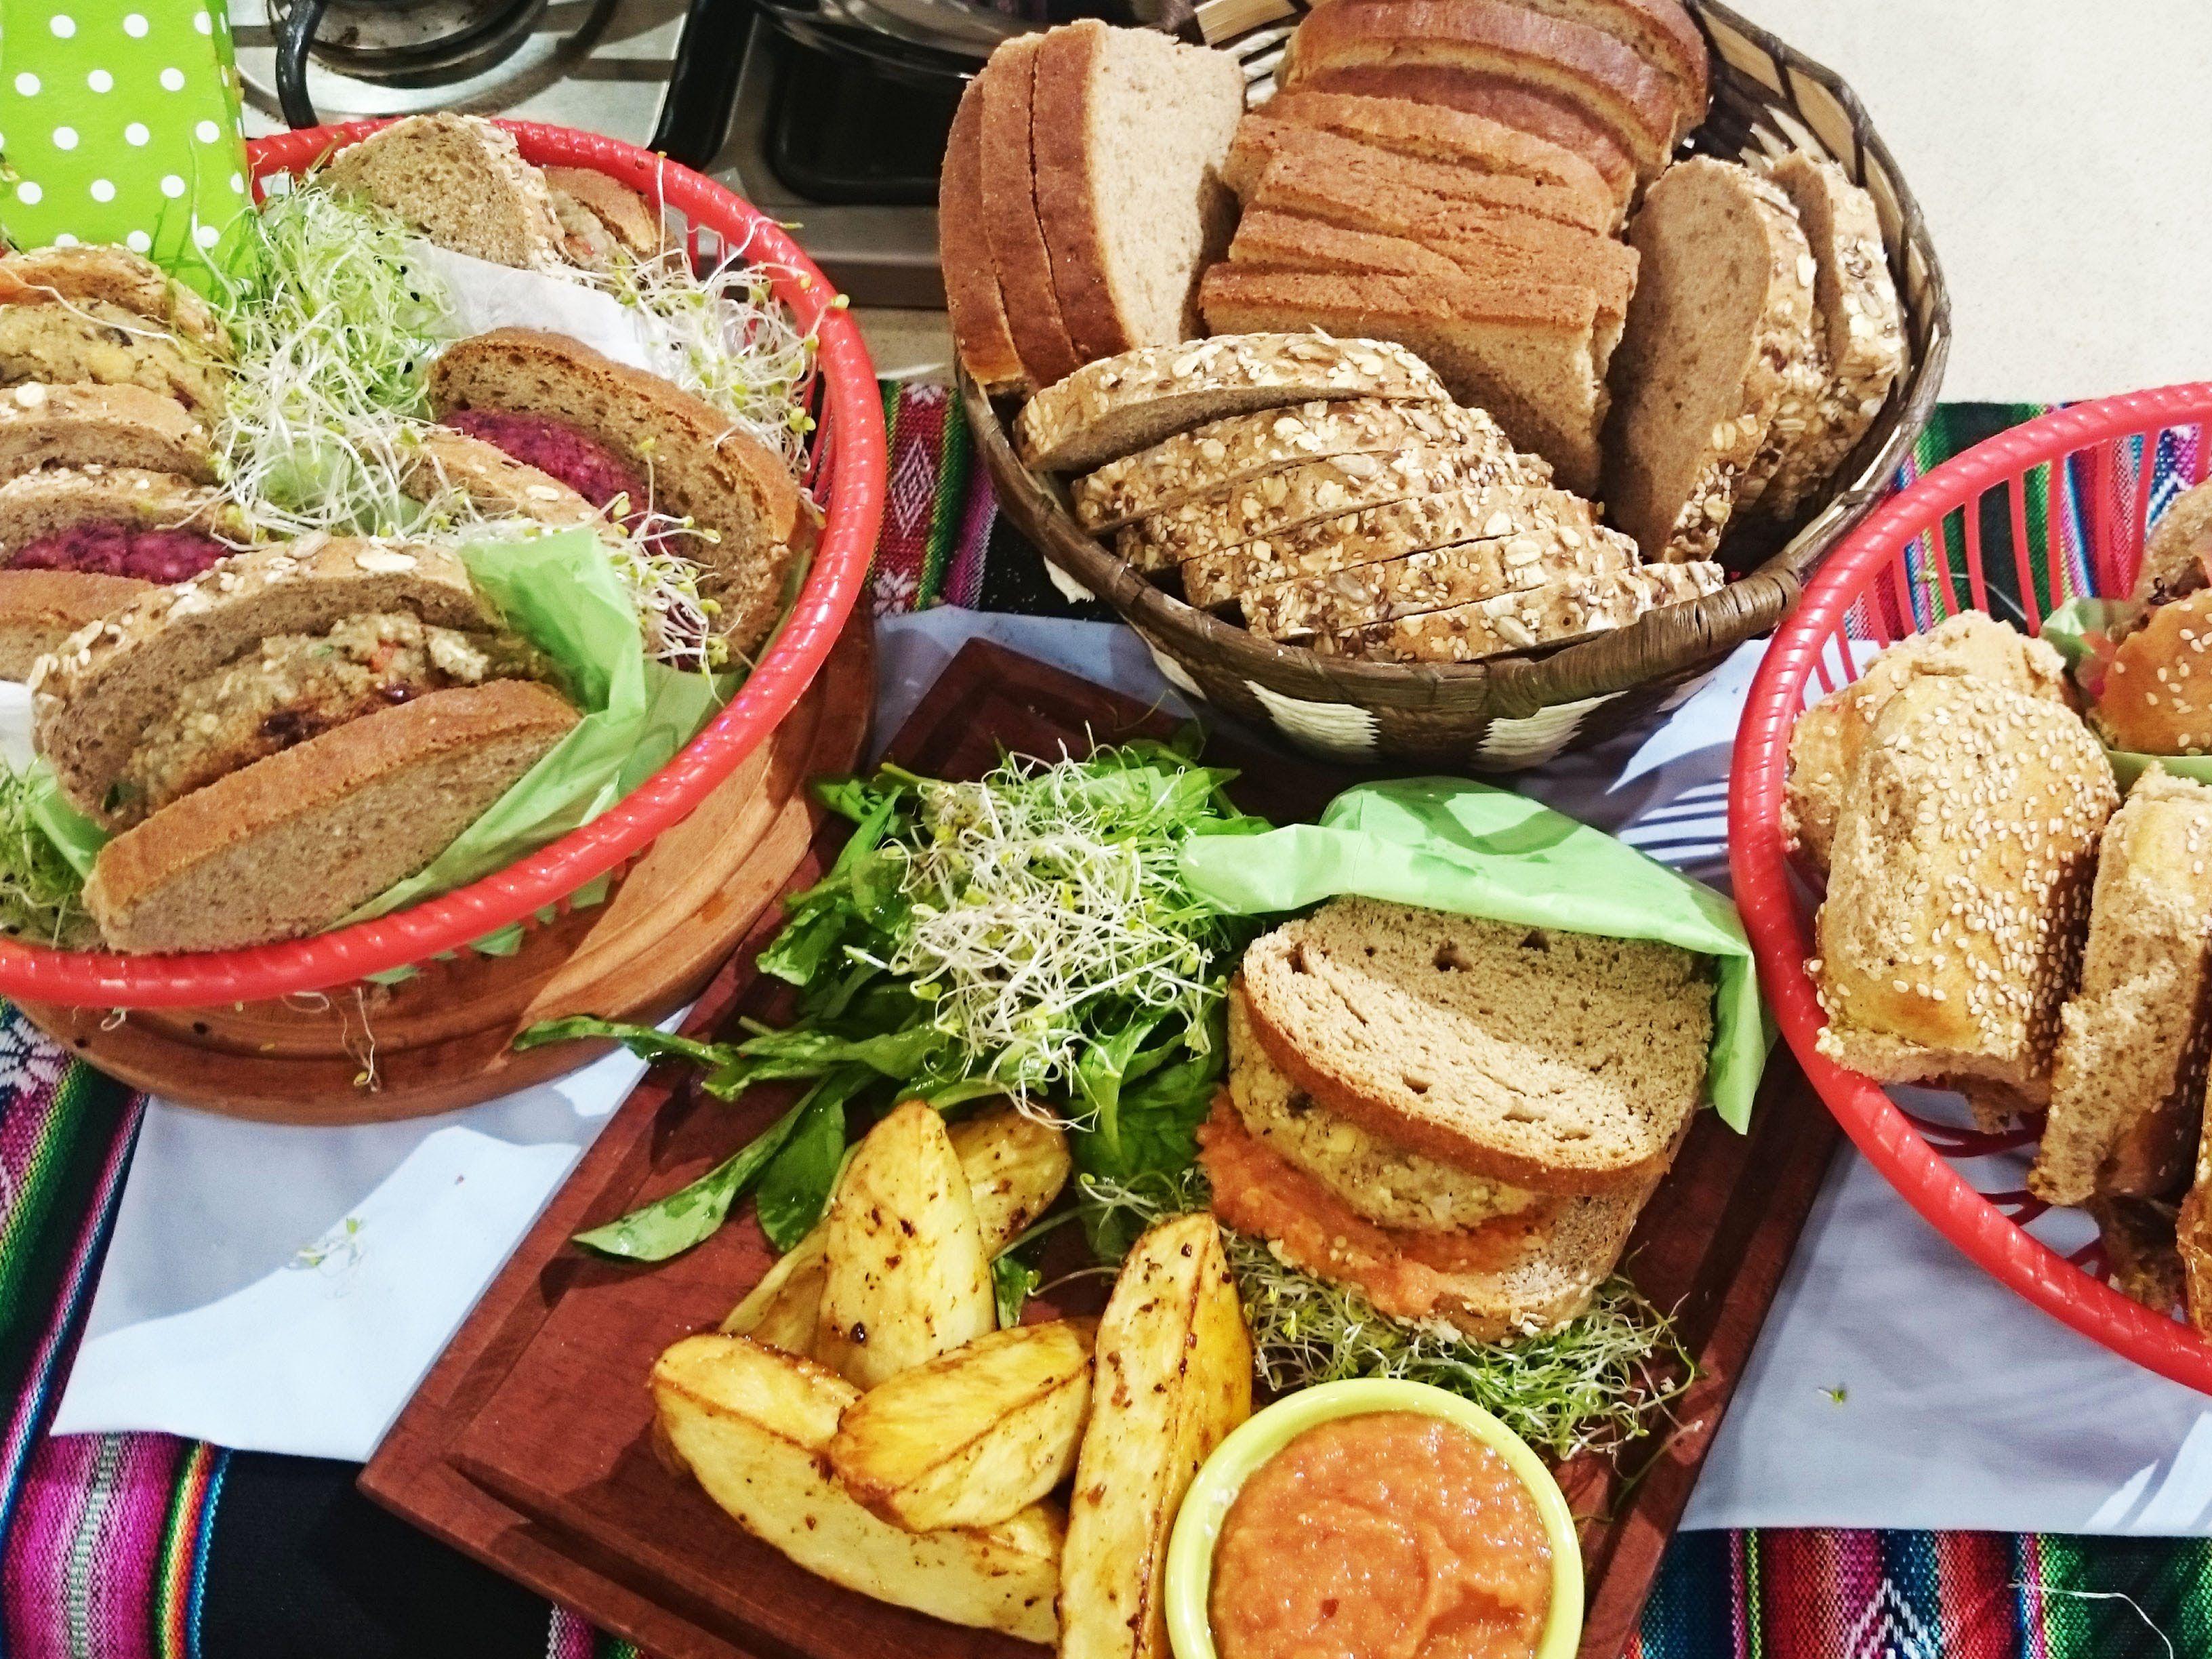 Hamburguesas de cebada y porotos mung youtube a hamburguesas de cebada y porotos mung youtube argentinavegetarian cookingyummy recipesyummy forumfinder Gallery